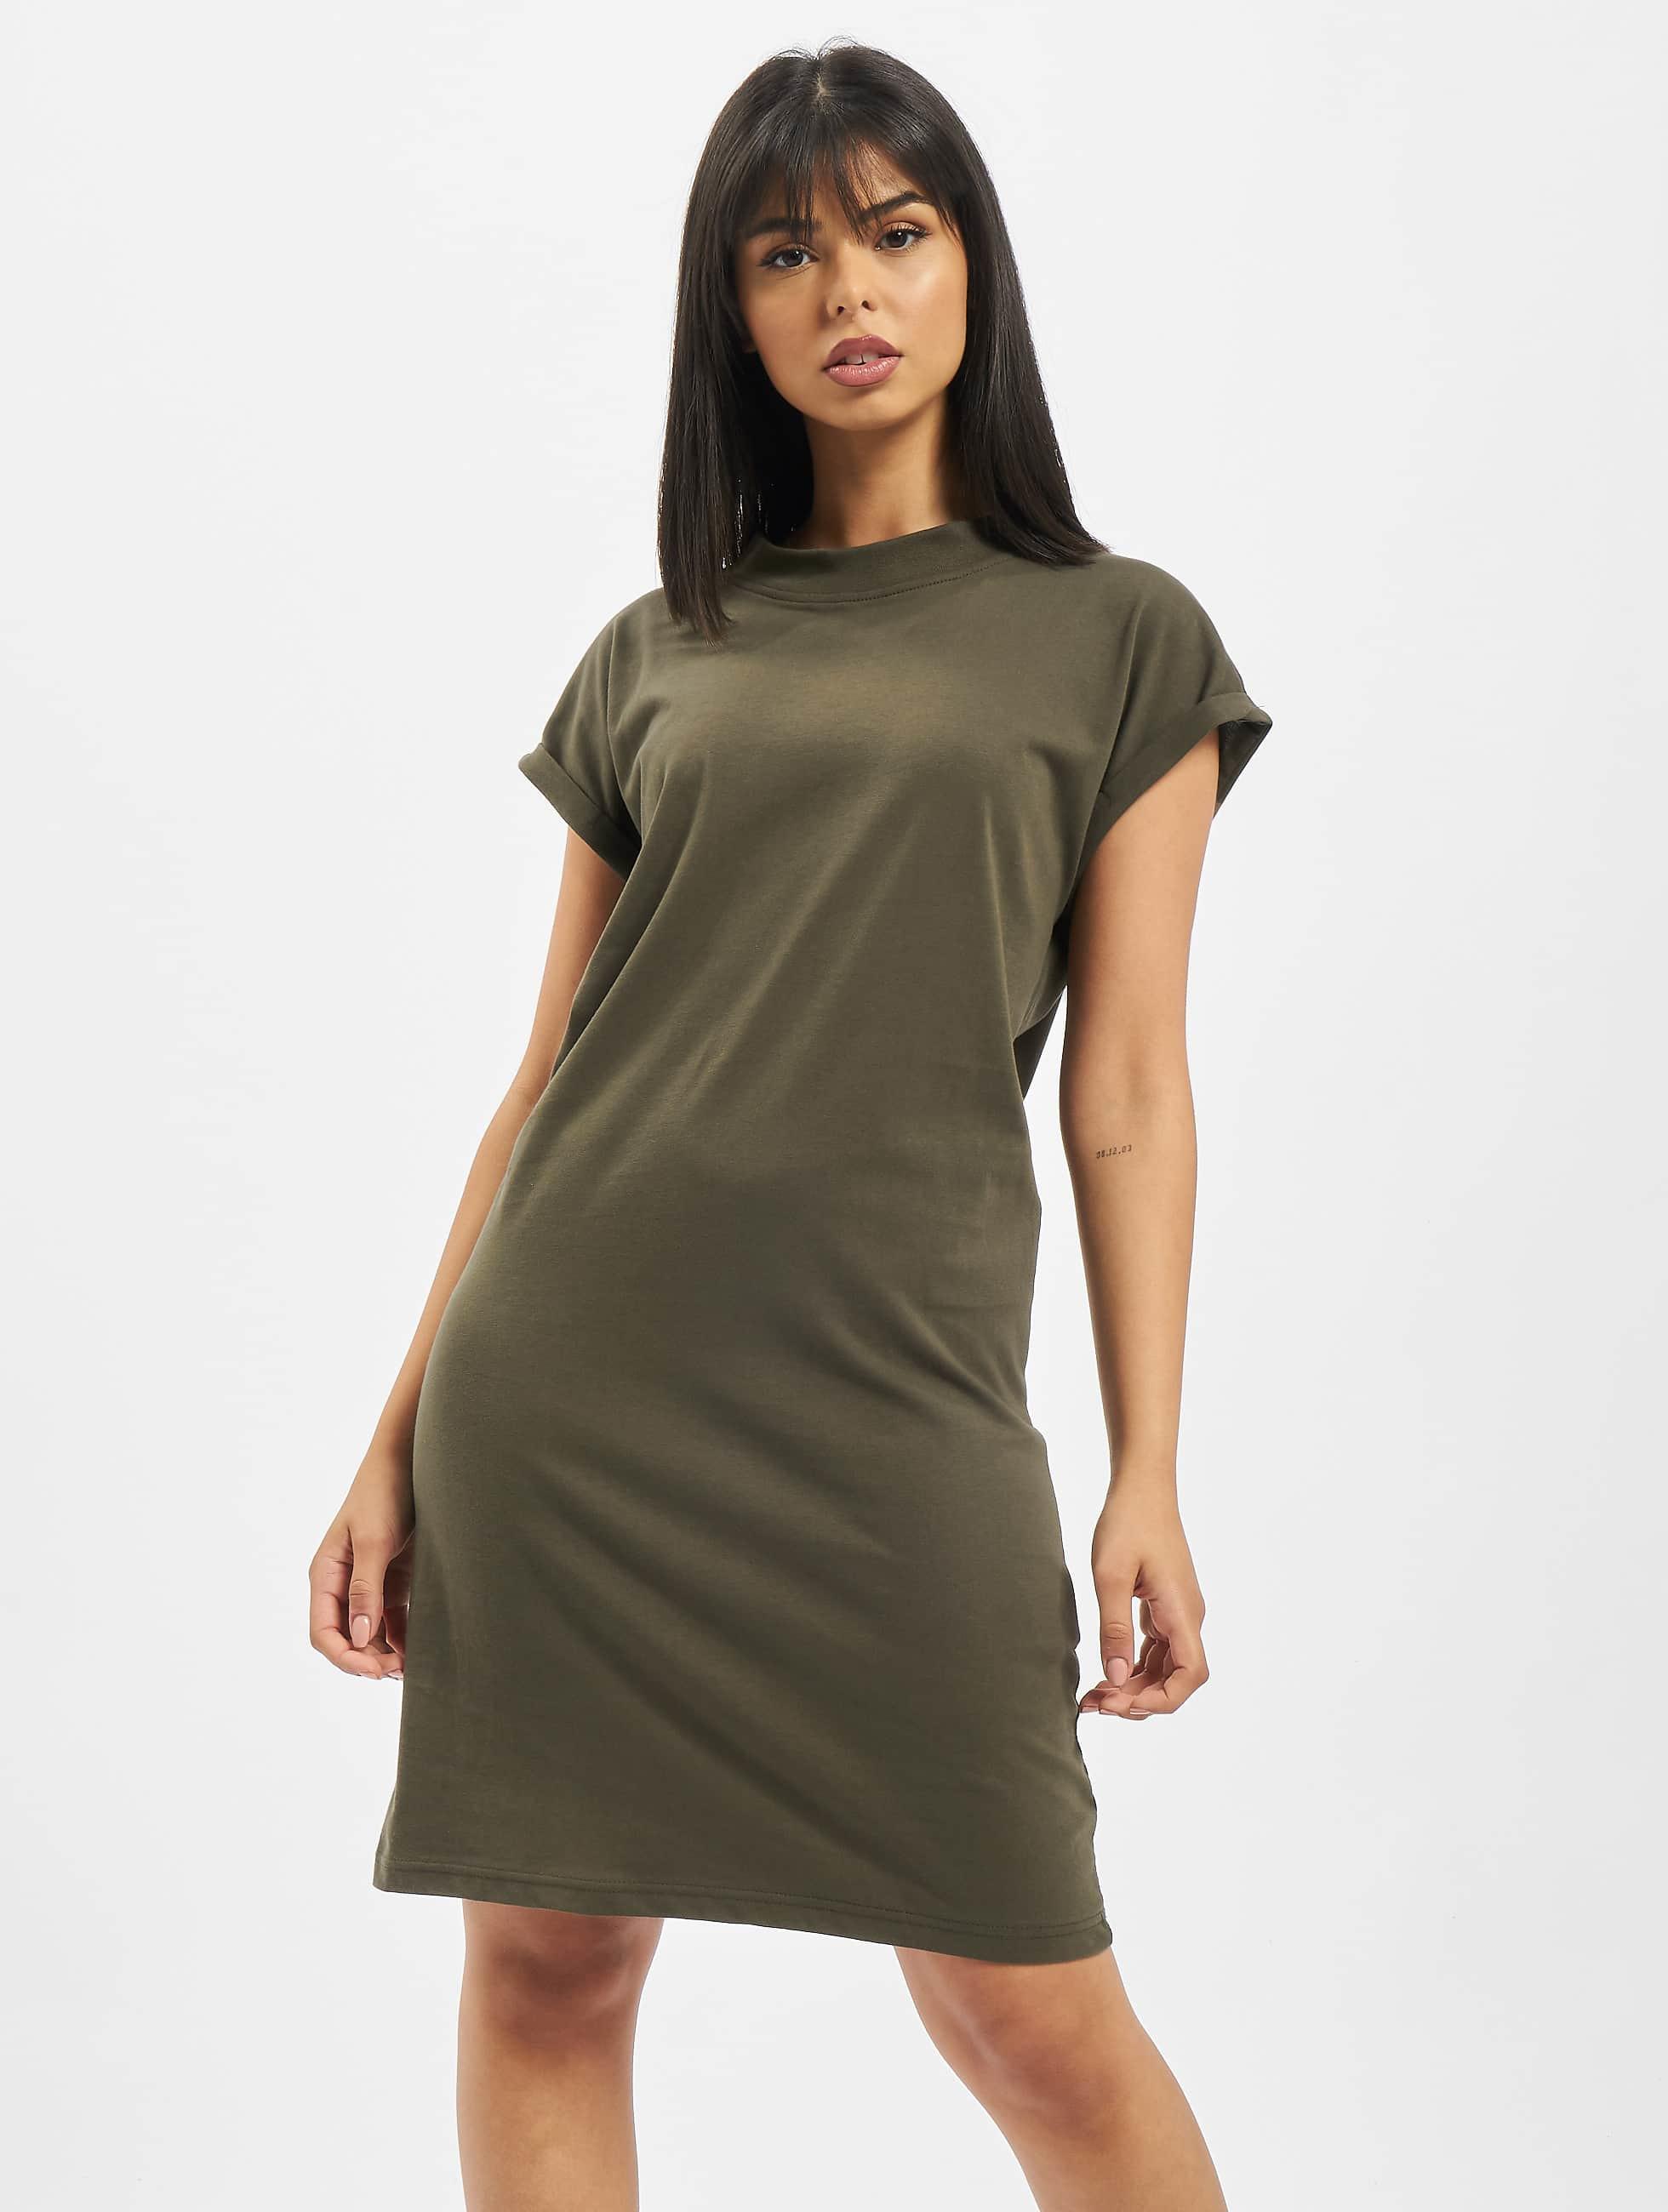 DEF / Dress Oliana in olive XS